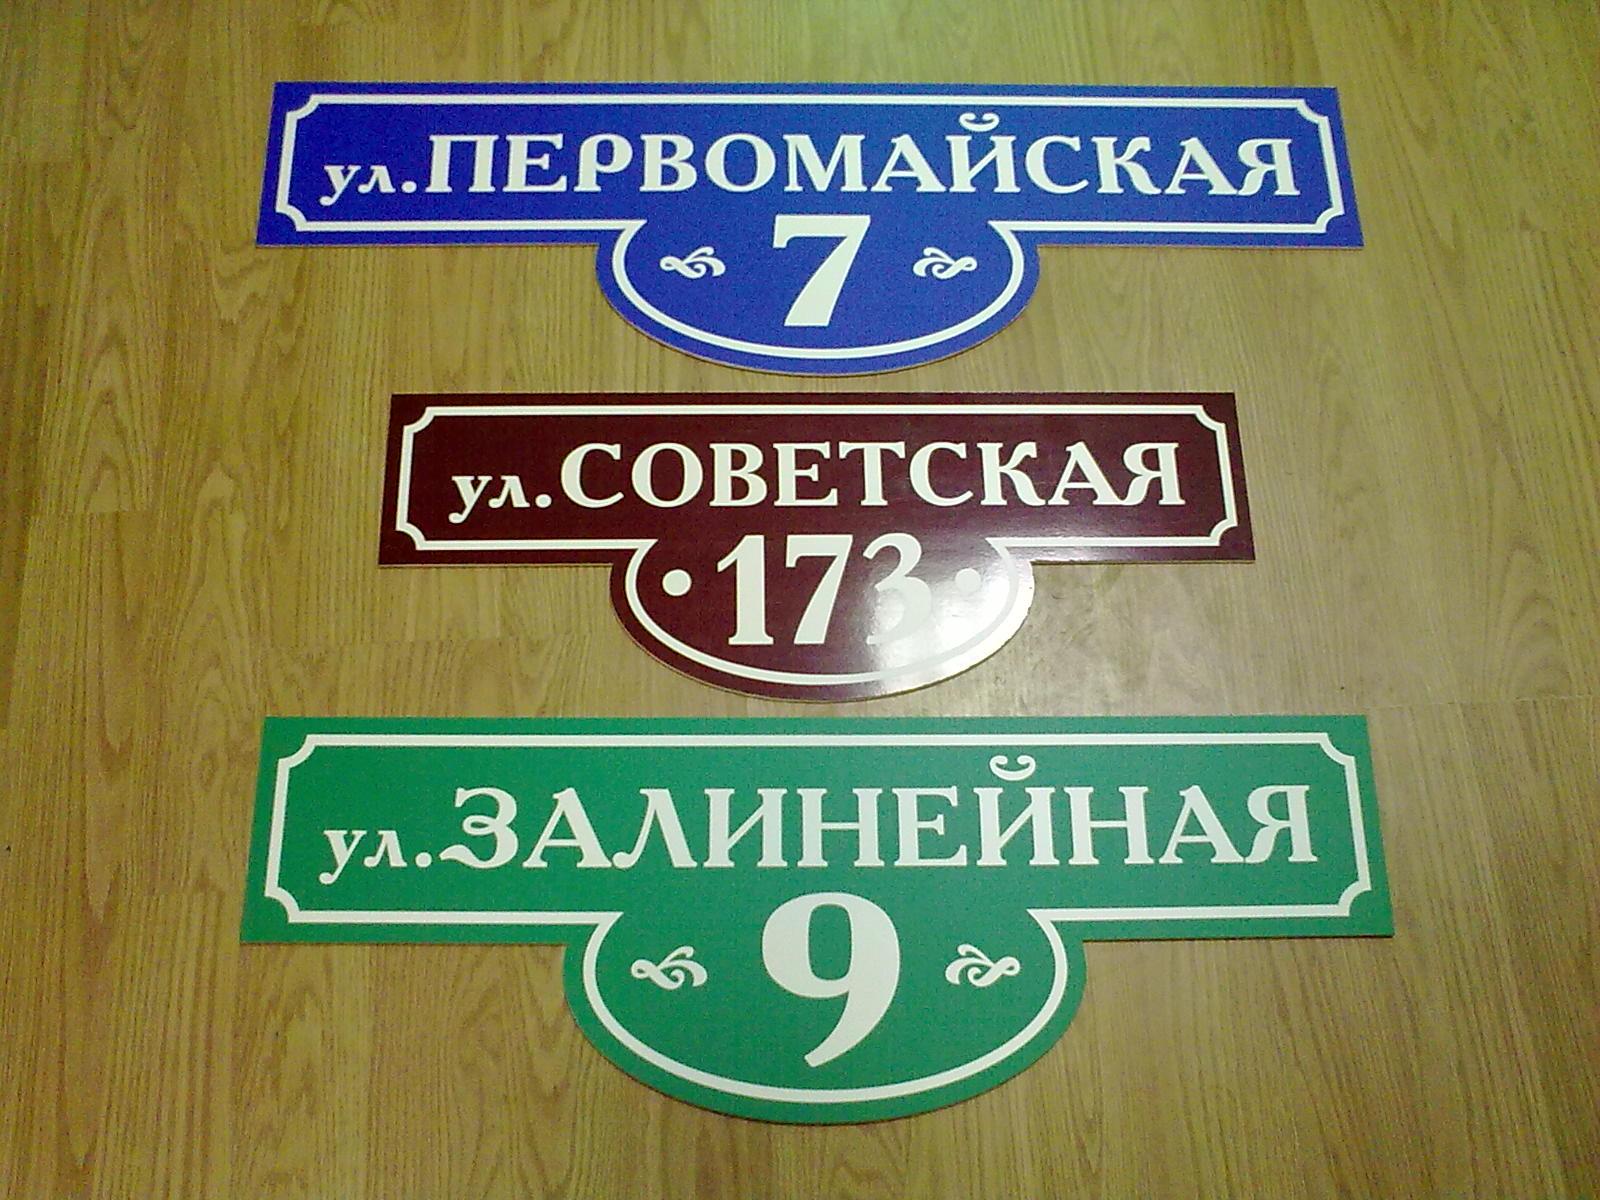 А давайте нашим улицам названия дадим!!! 831815775